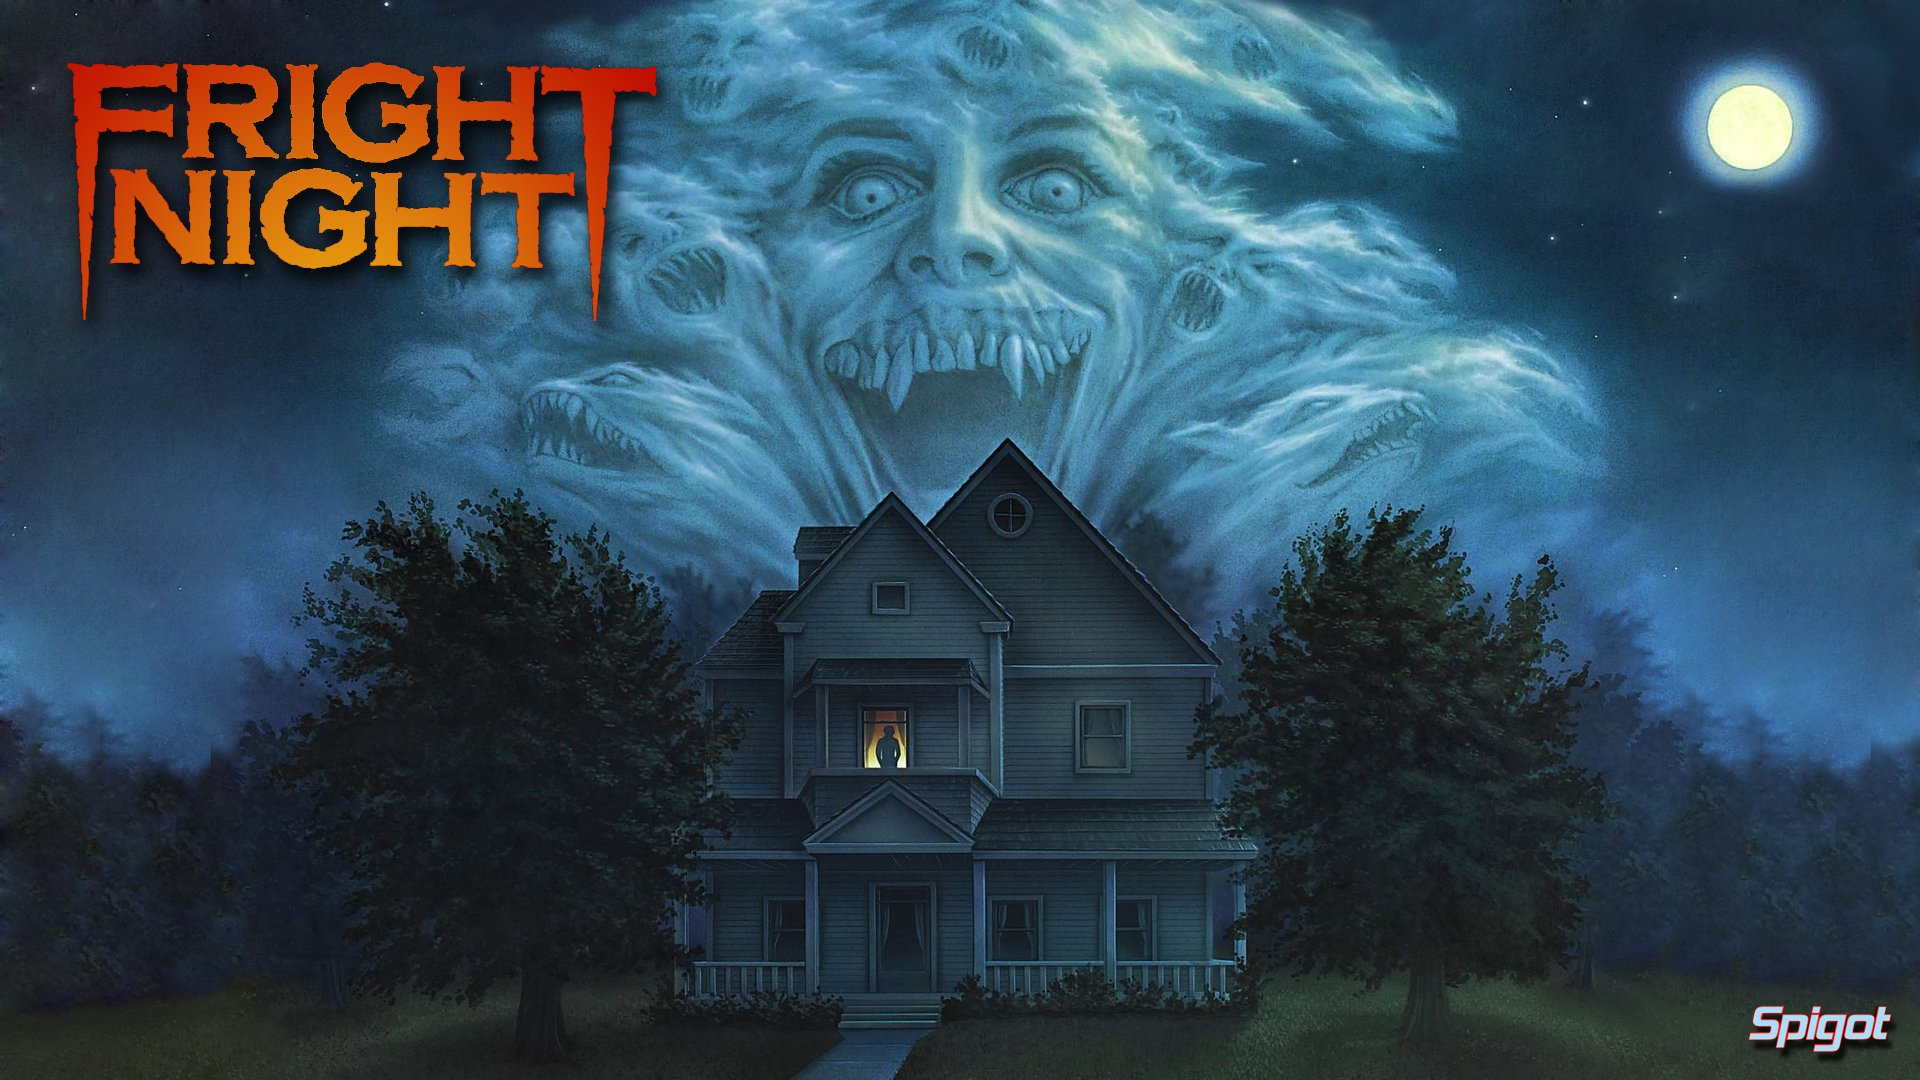 fright night comedy horror dark movie film halloween vampire poster haunted wallpaper 1920x1080 331338 wallpaperup